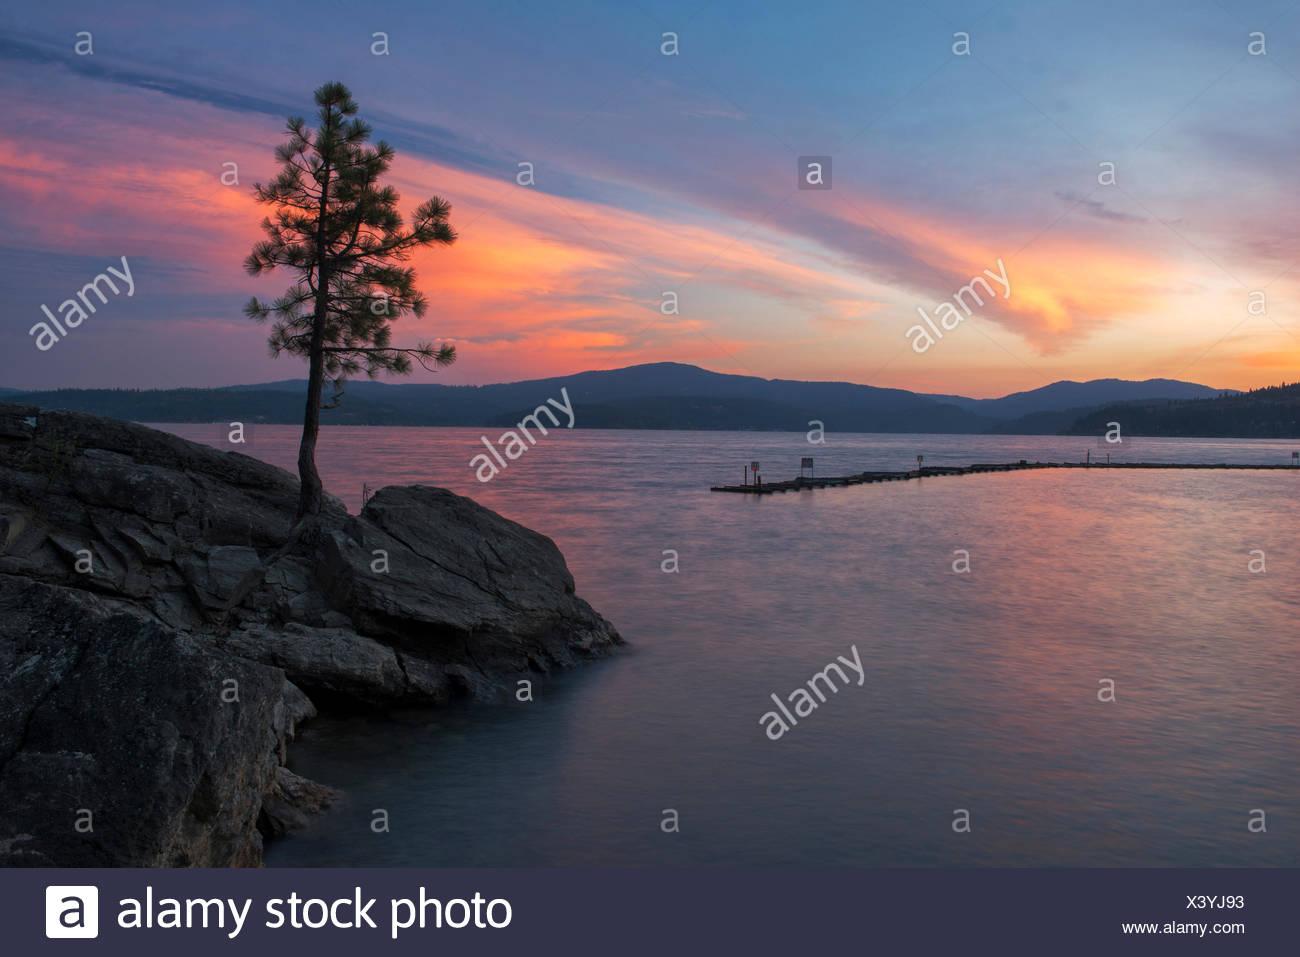 USA, United States, America, Idaho, Coeur d'Alene, shore, Rockies, rocky mountains, sunset, ship, lakefront, evening, pine tree, - Stock Image